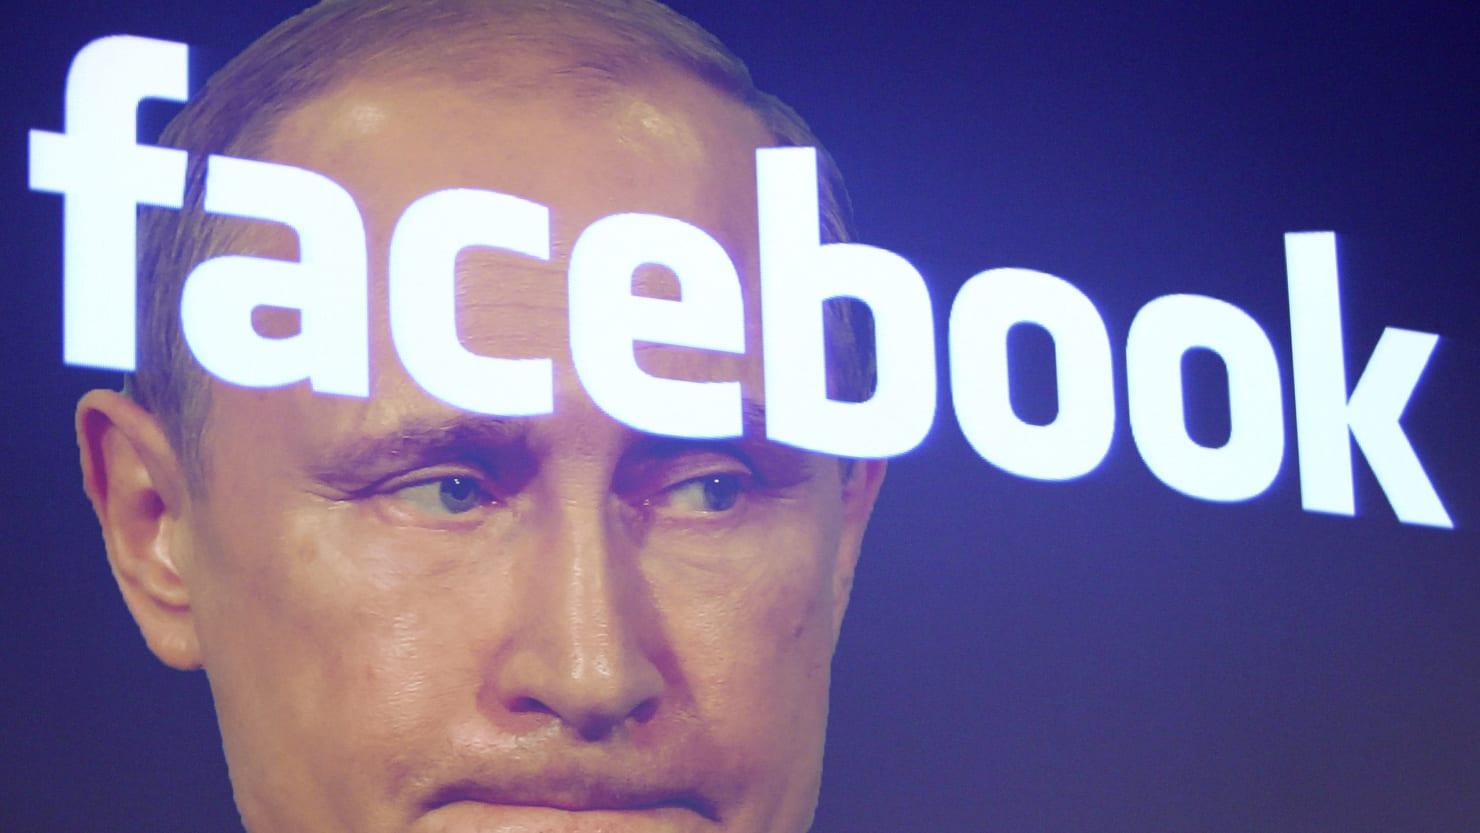 Rússia entra numa guerra digital com Facebook